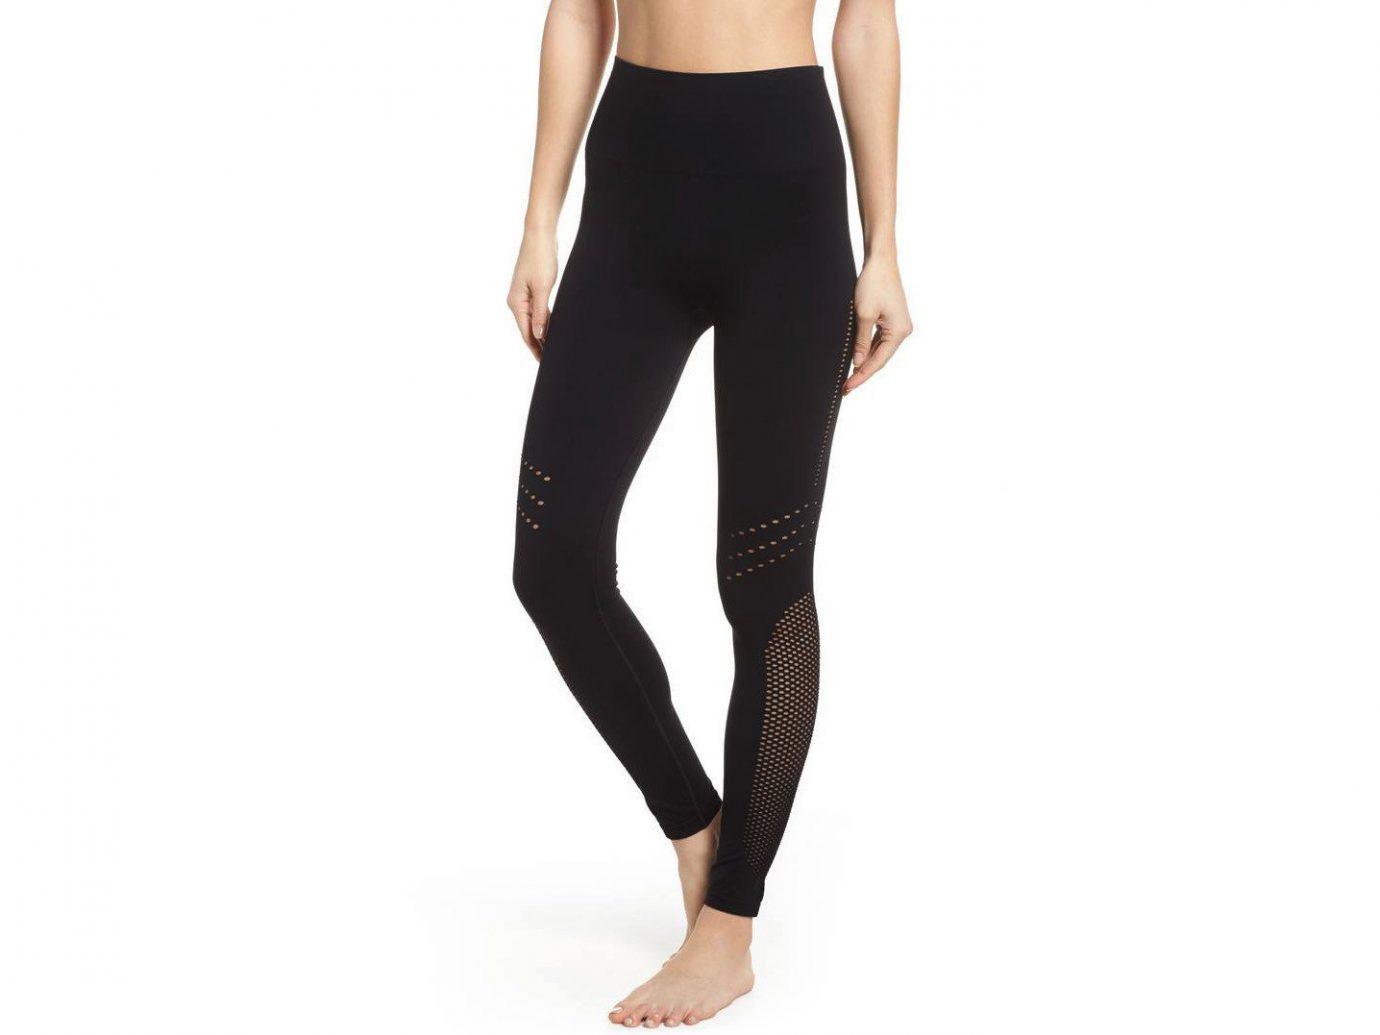 Style + Design Travel Shop clothing woman leggings tights waist human leg trousers active undergarment joint abdomen active pants thigh posing female trouser